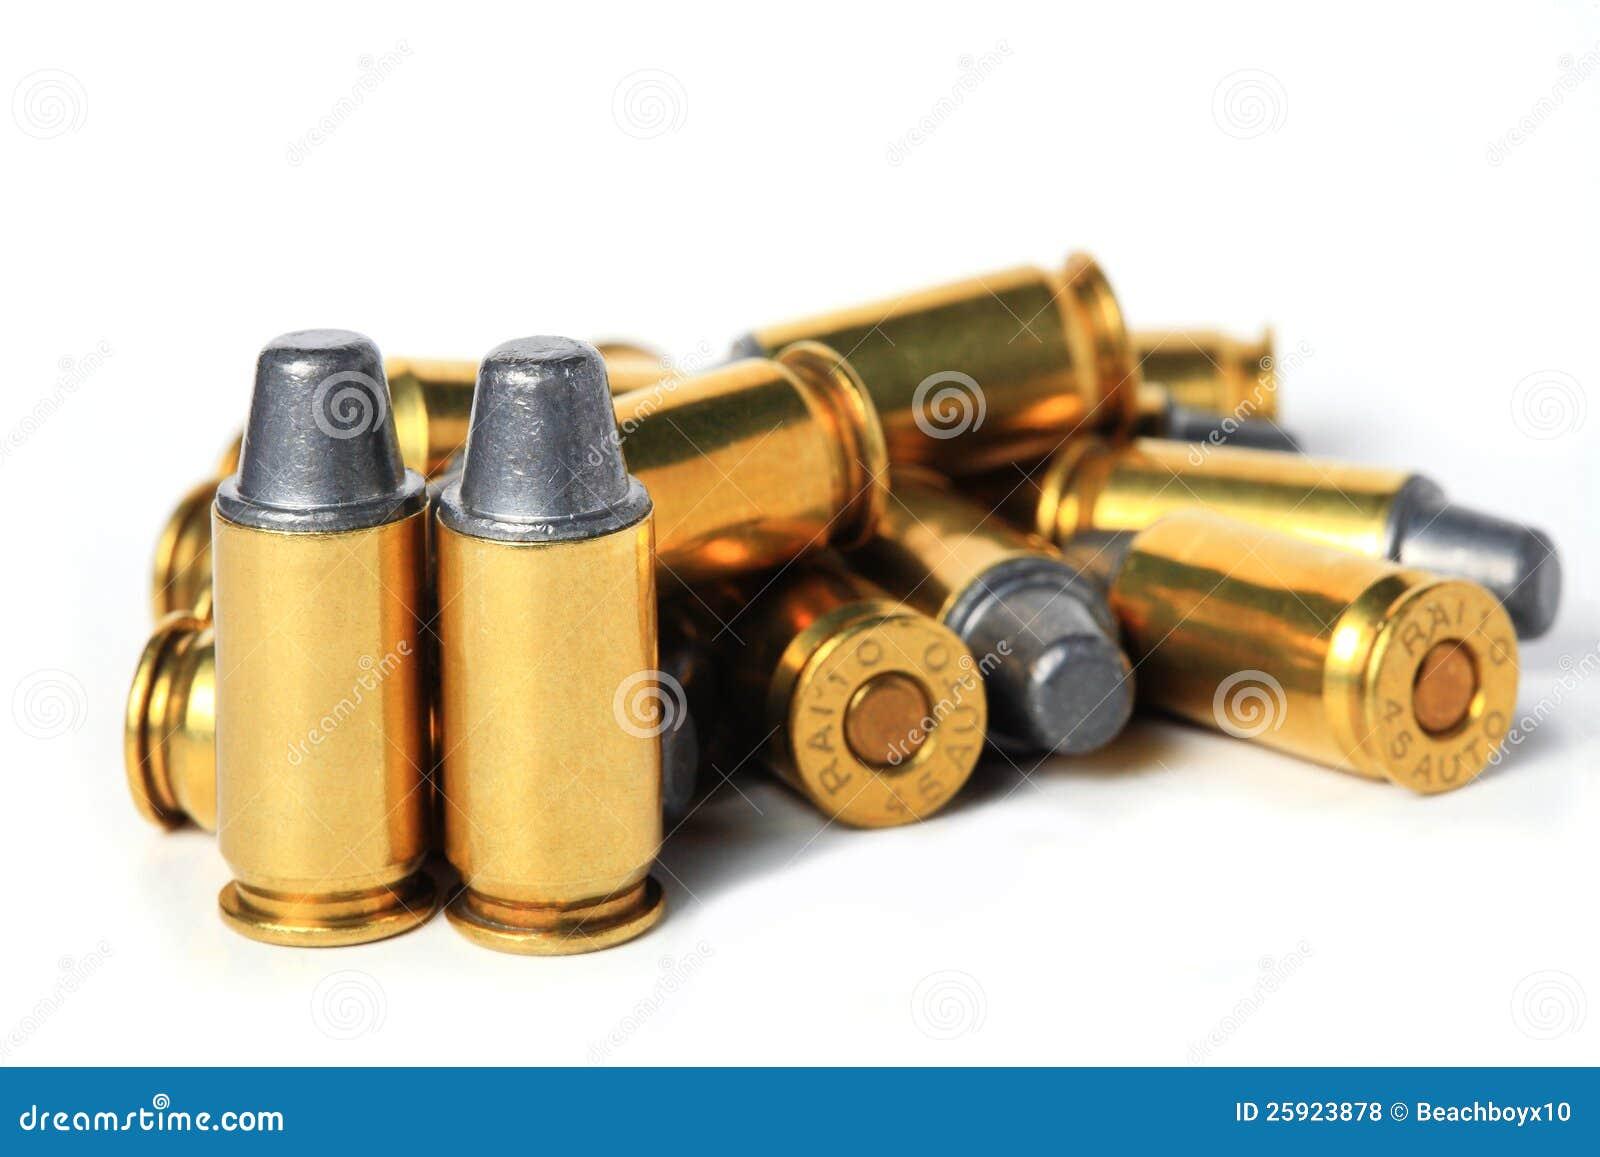 D&L Sports™ .45 ACP Special Ball Ammunition